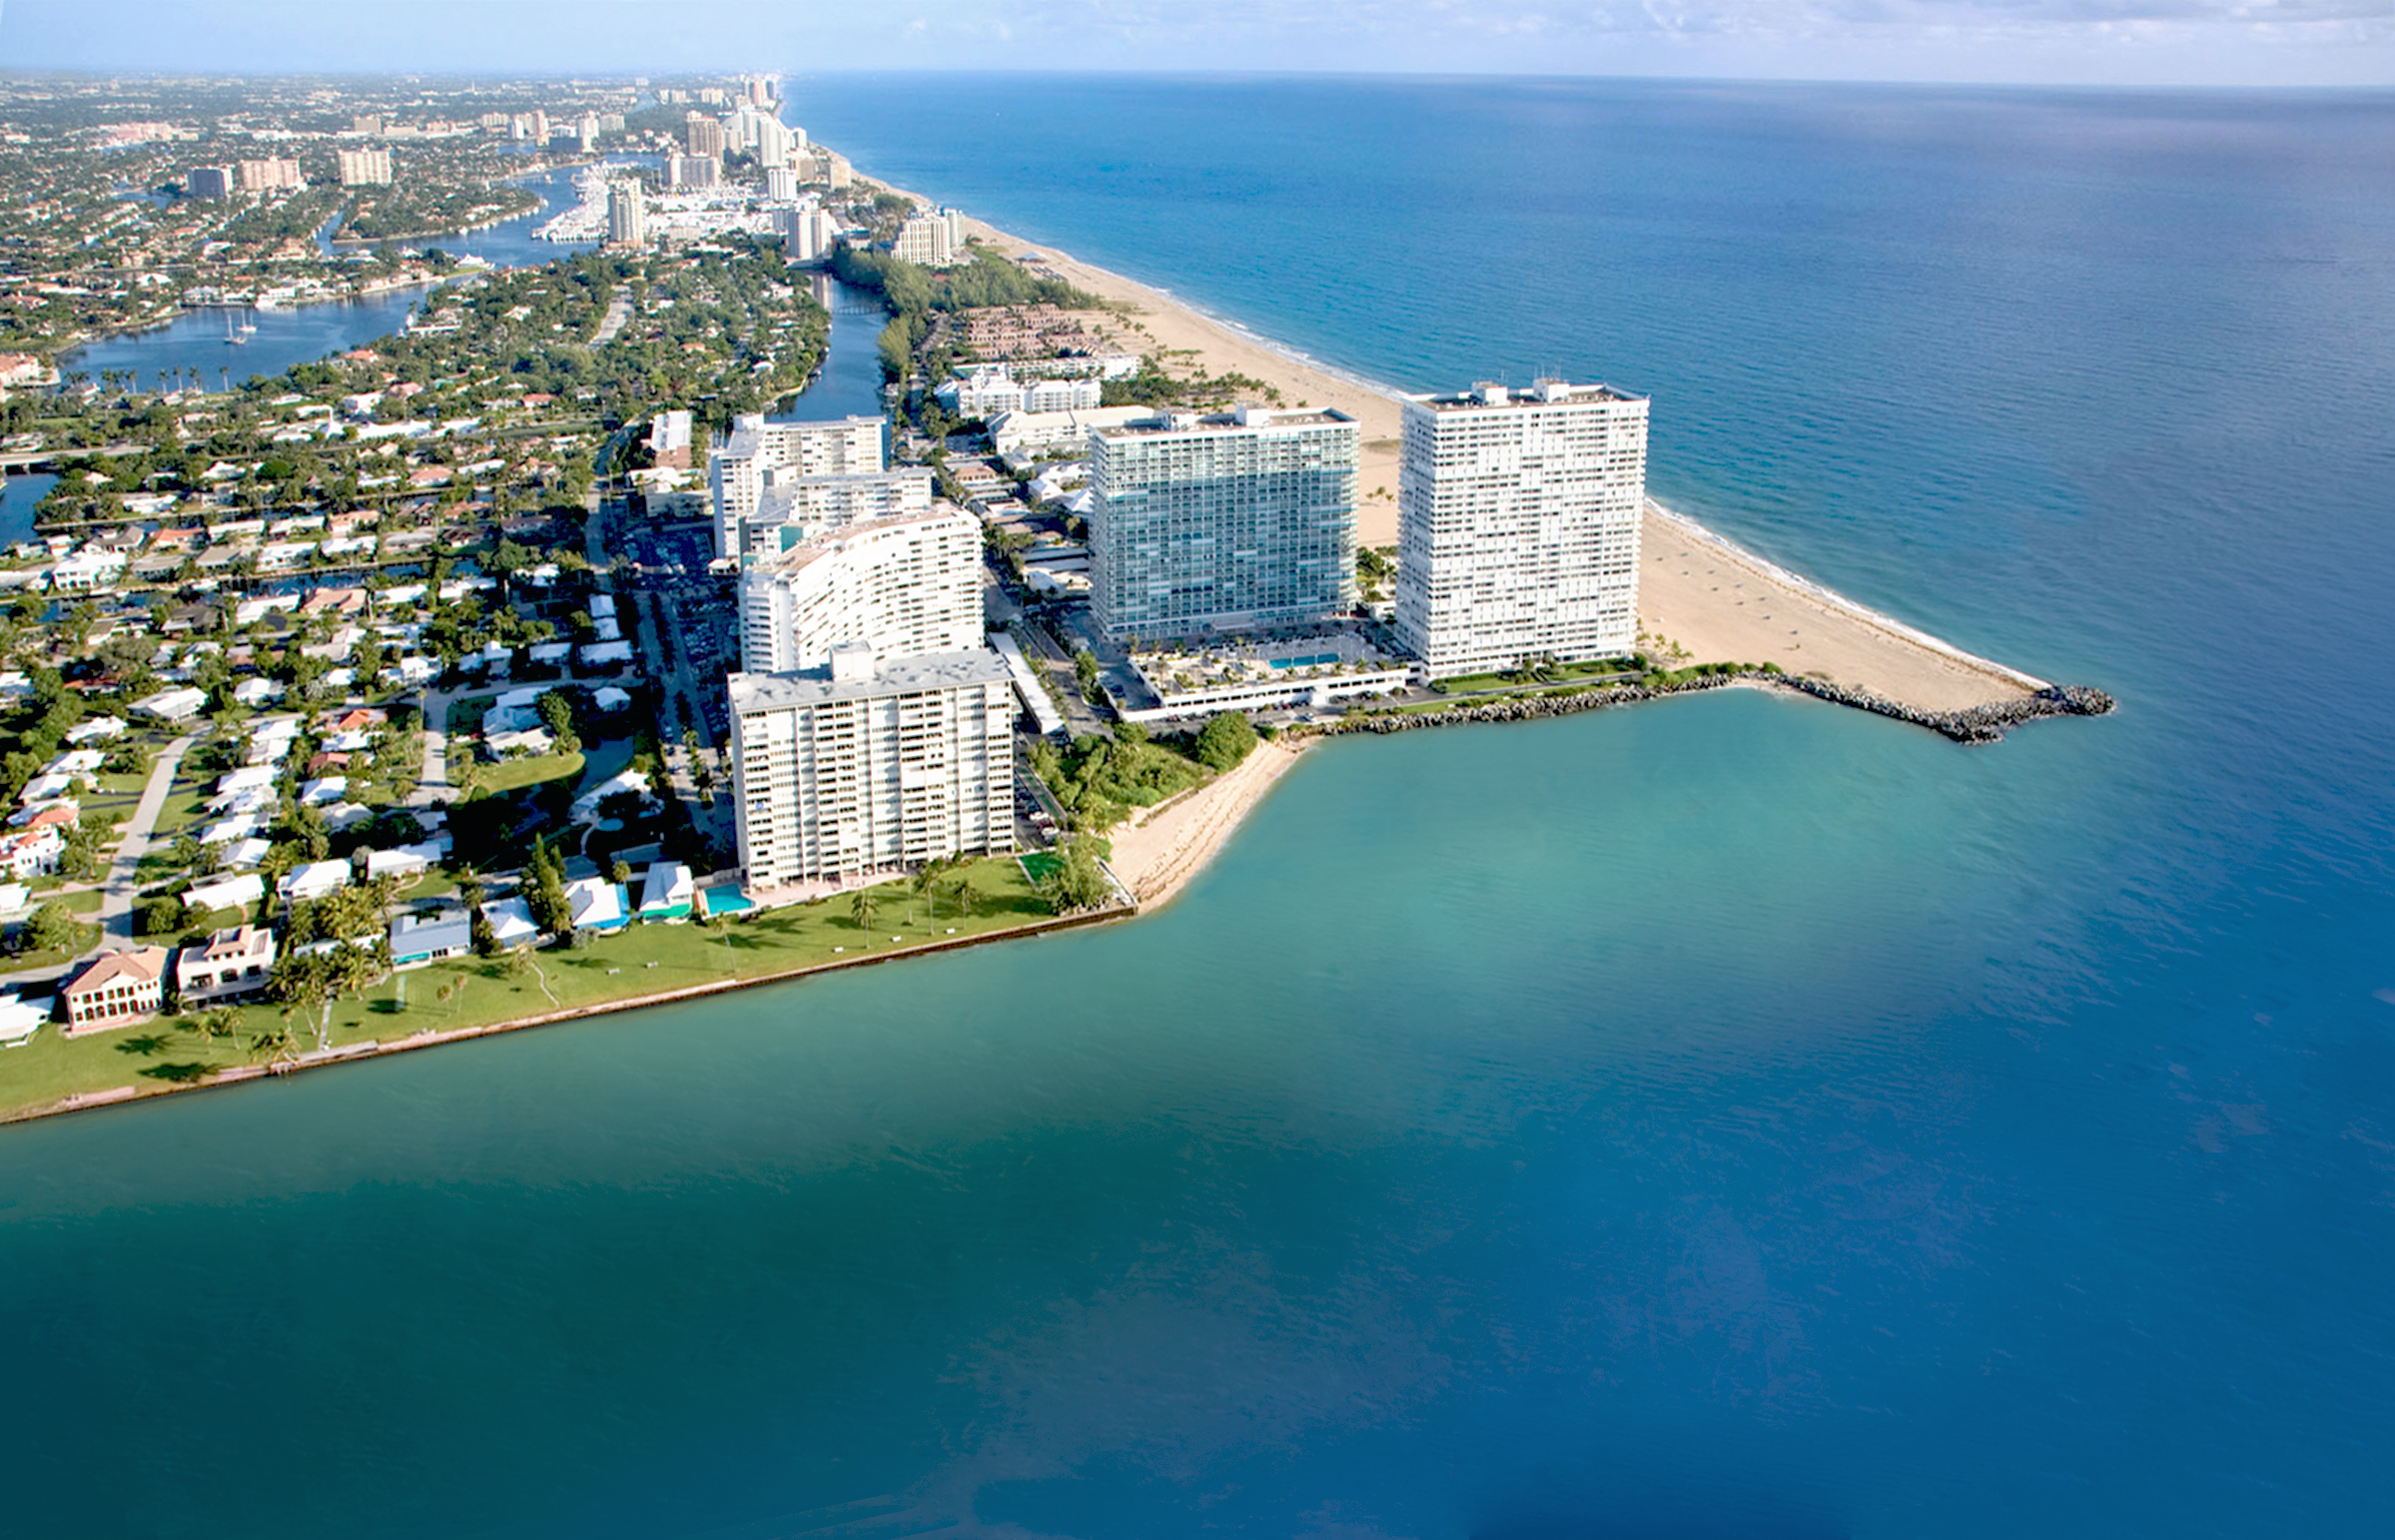 Căn hộ vì Bán tại 2200 S Ocean Ln #1204 2200 S Ocean Ln 1204 Fort Lauderdale, Florida, 33316 Hoa Kỳ